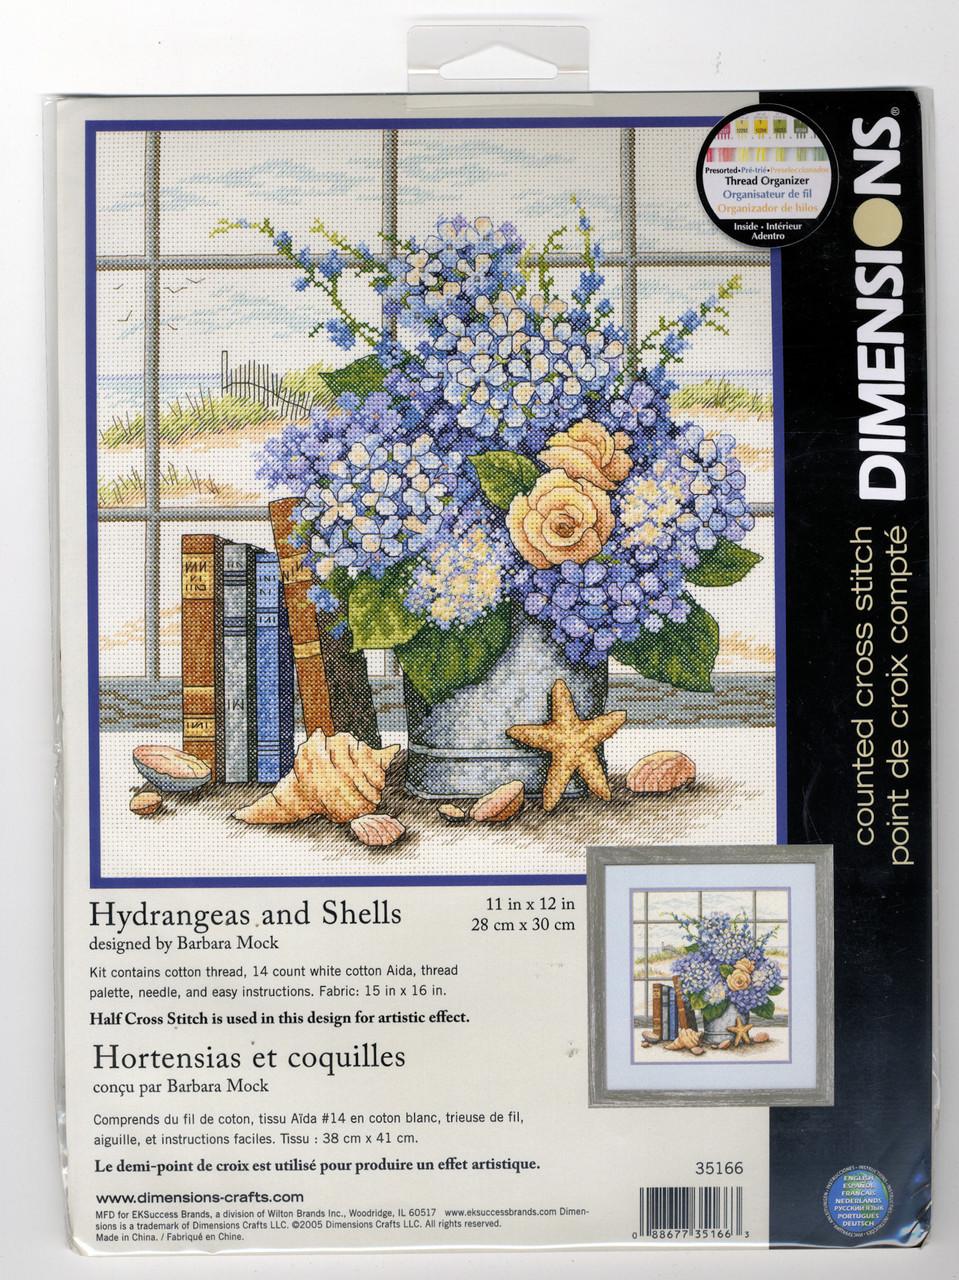 Dimensions - Hydrangeas and Shells